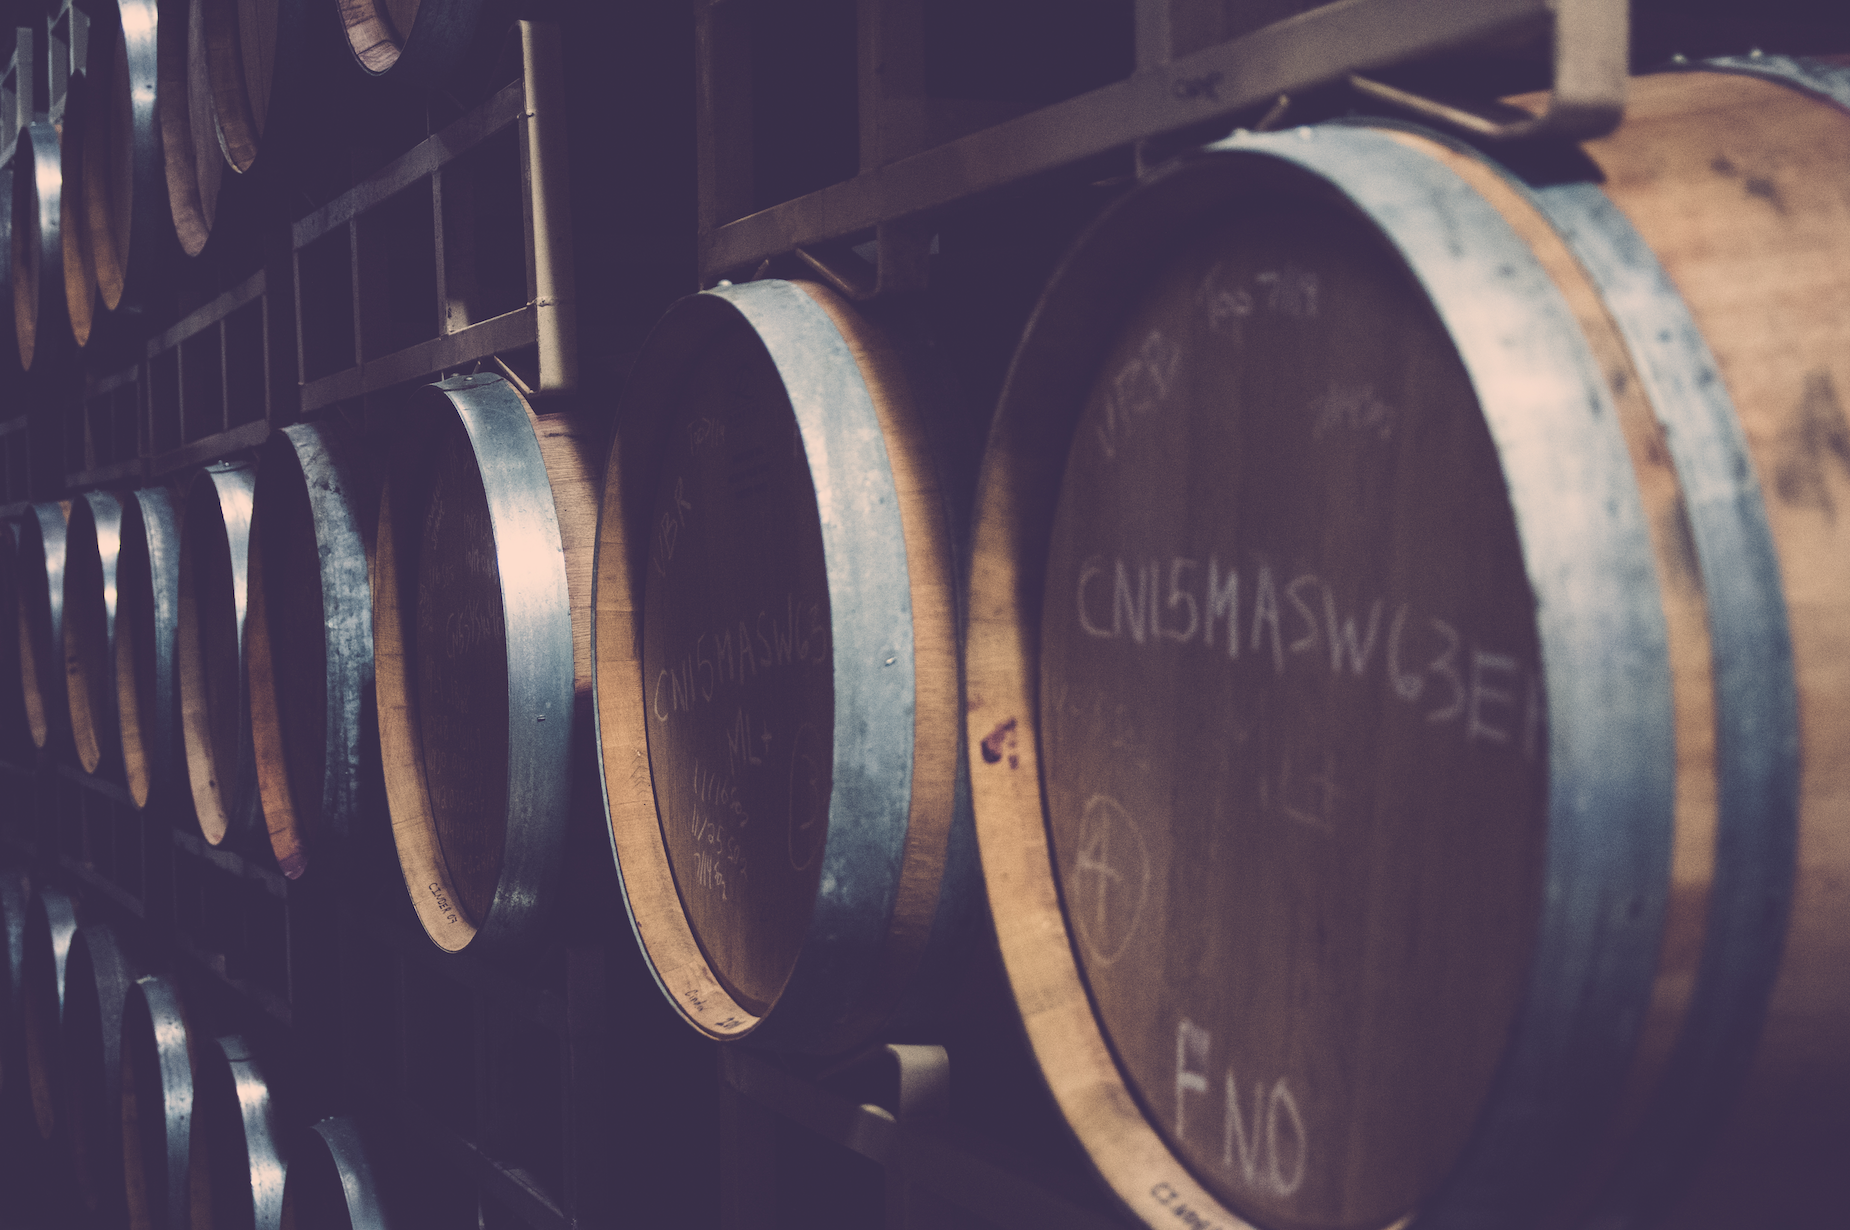 Barrels in a winery